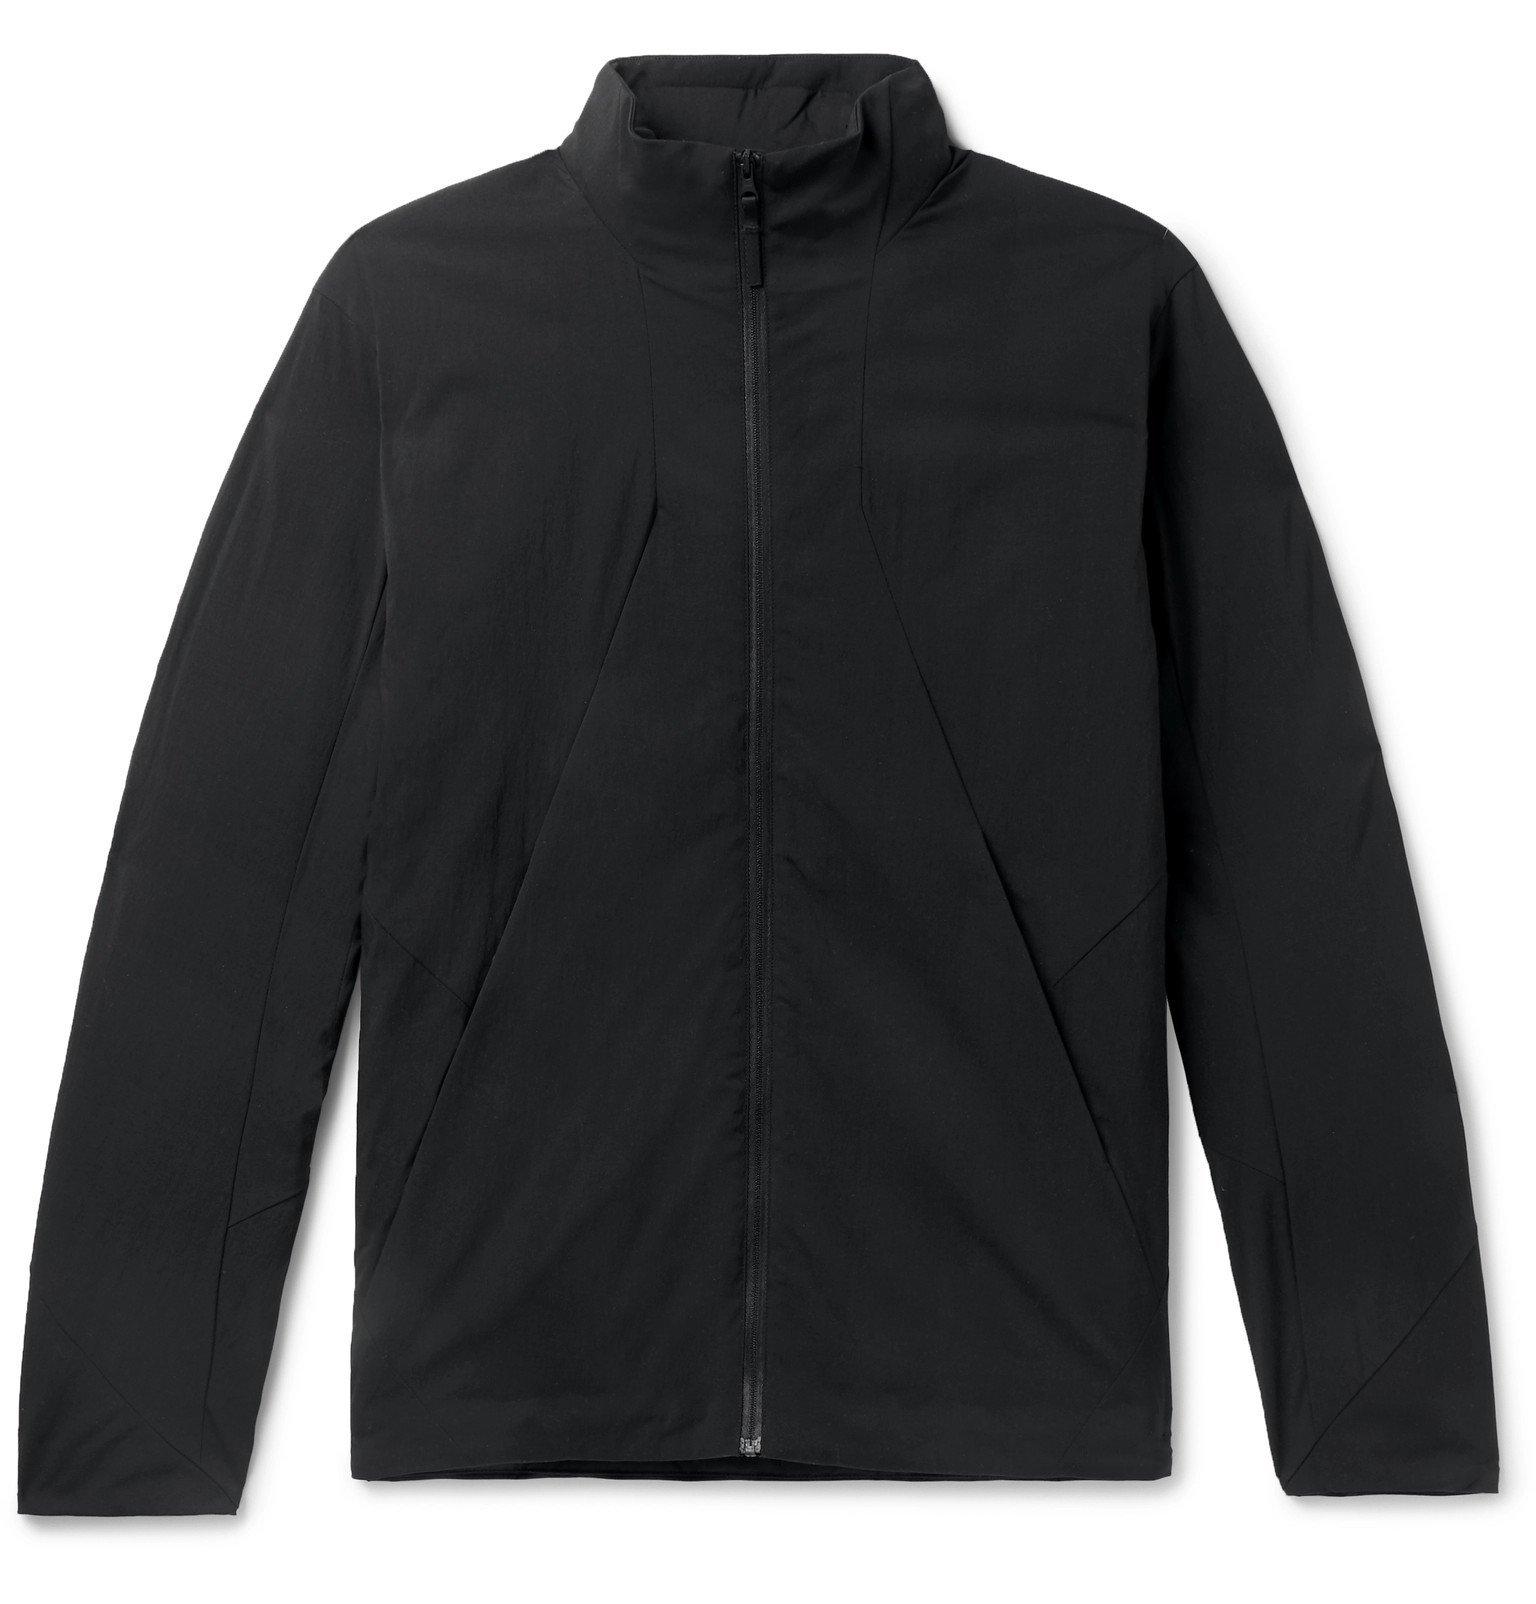 Arc'teryx Veilance - Mionn IS Shell Padded Jacket - Black